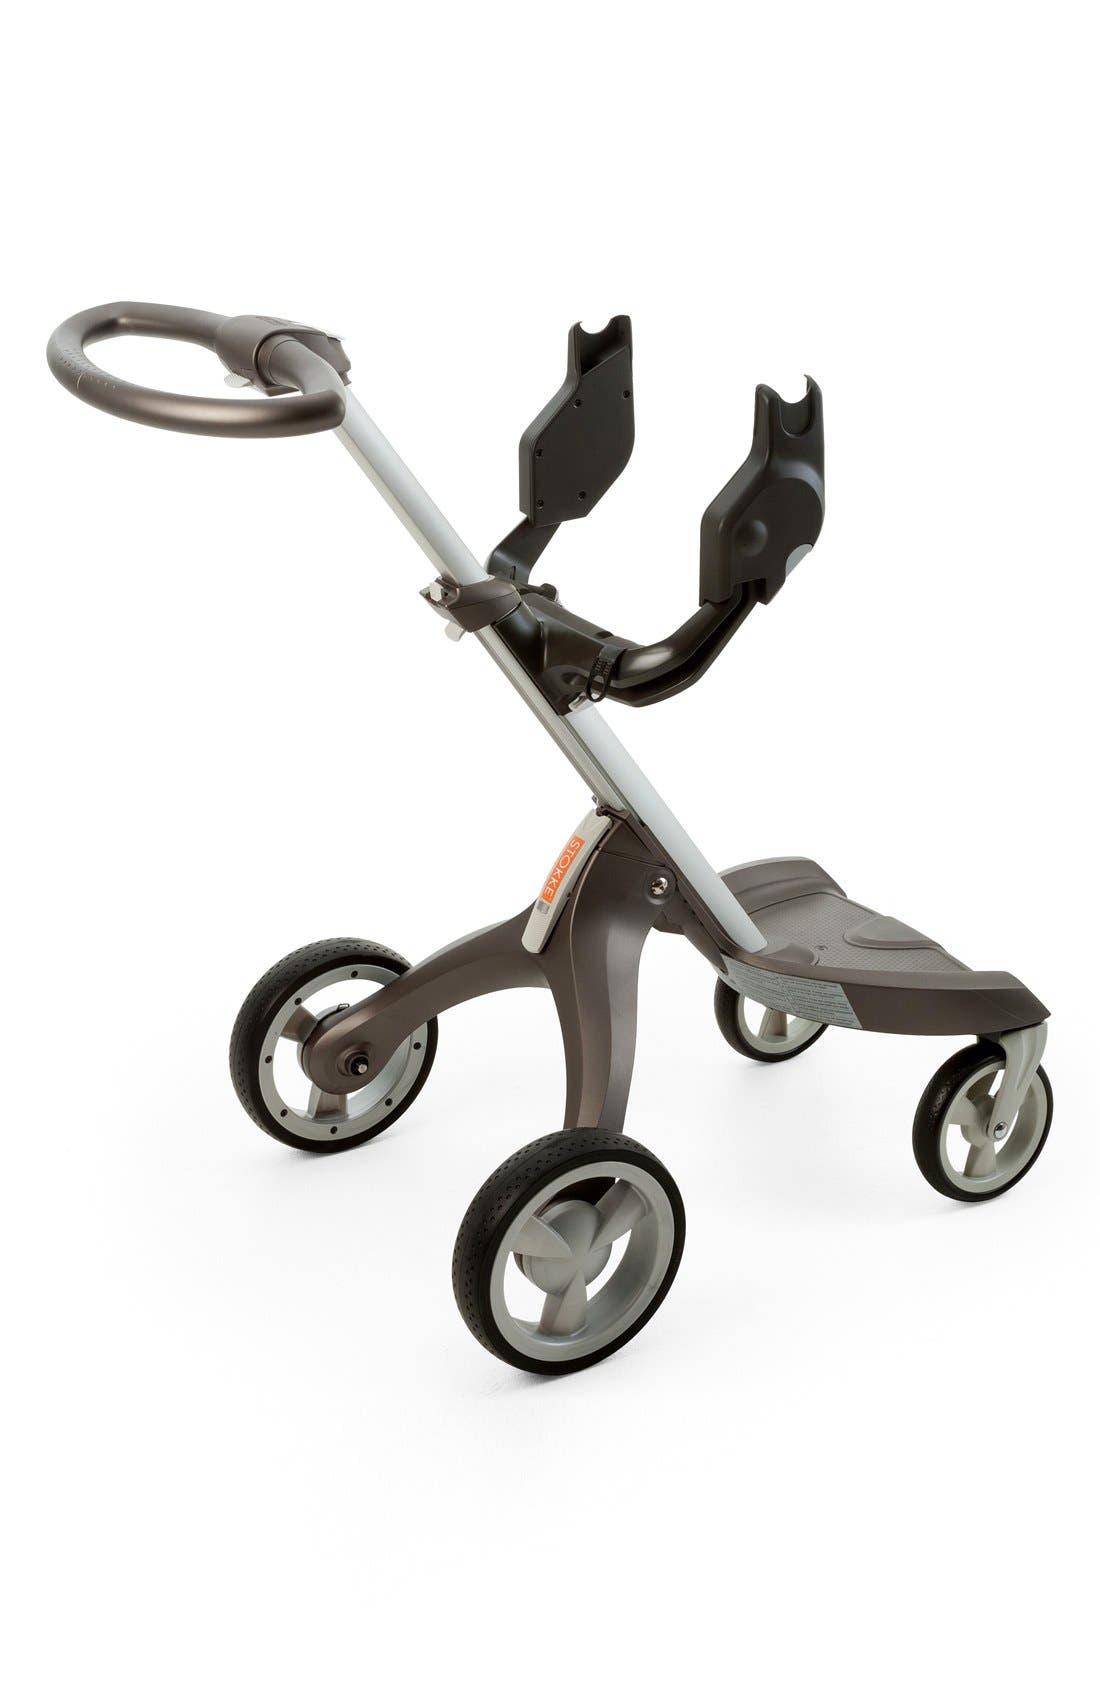 Alternate Image 2  - Stokke 'Xplory®' & Stokke 'Scoot' Car Seat Adaptor for Maxi Cosi & Nuna